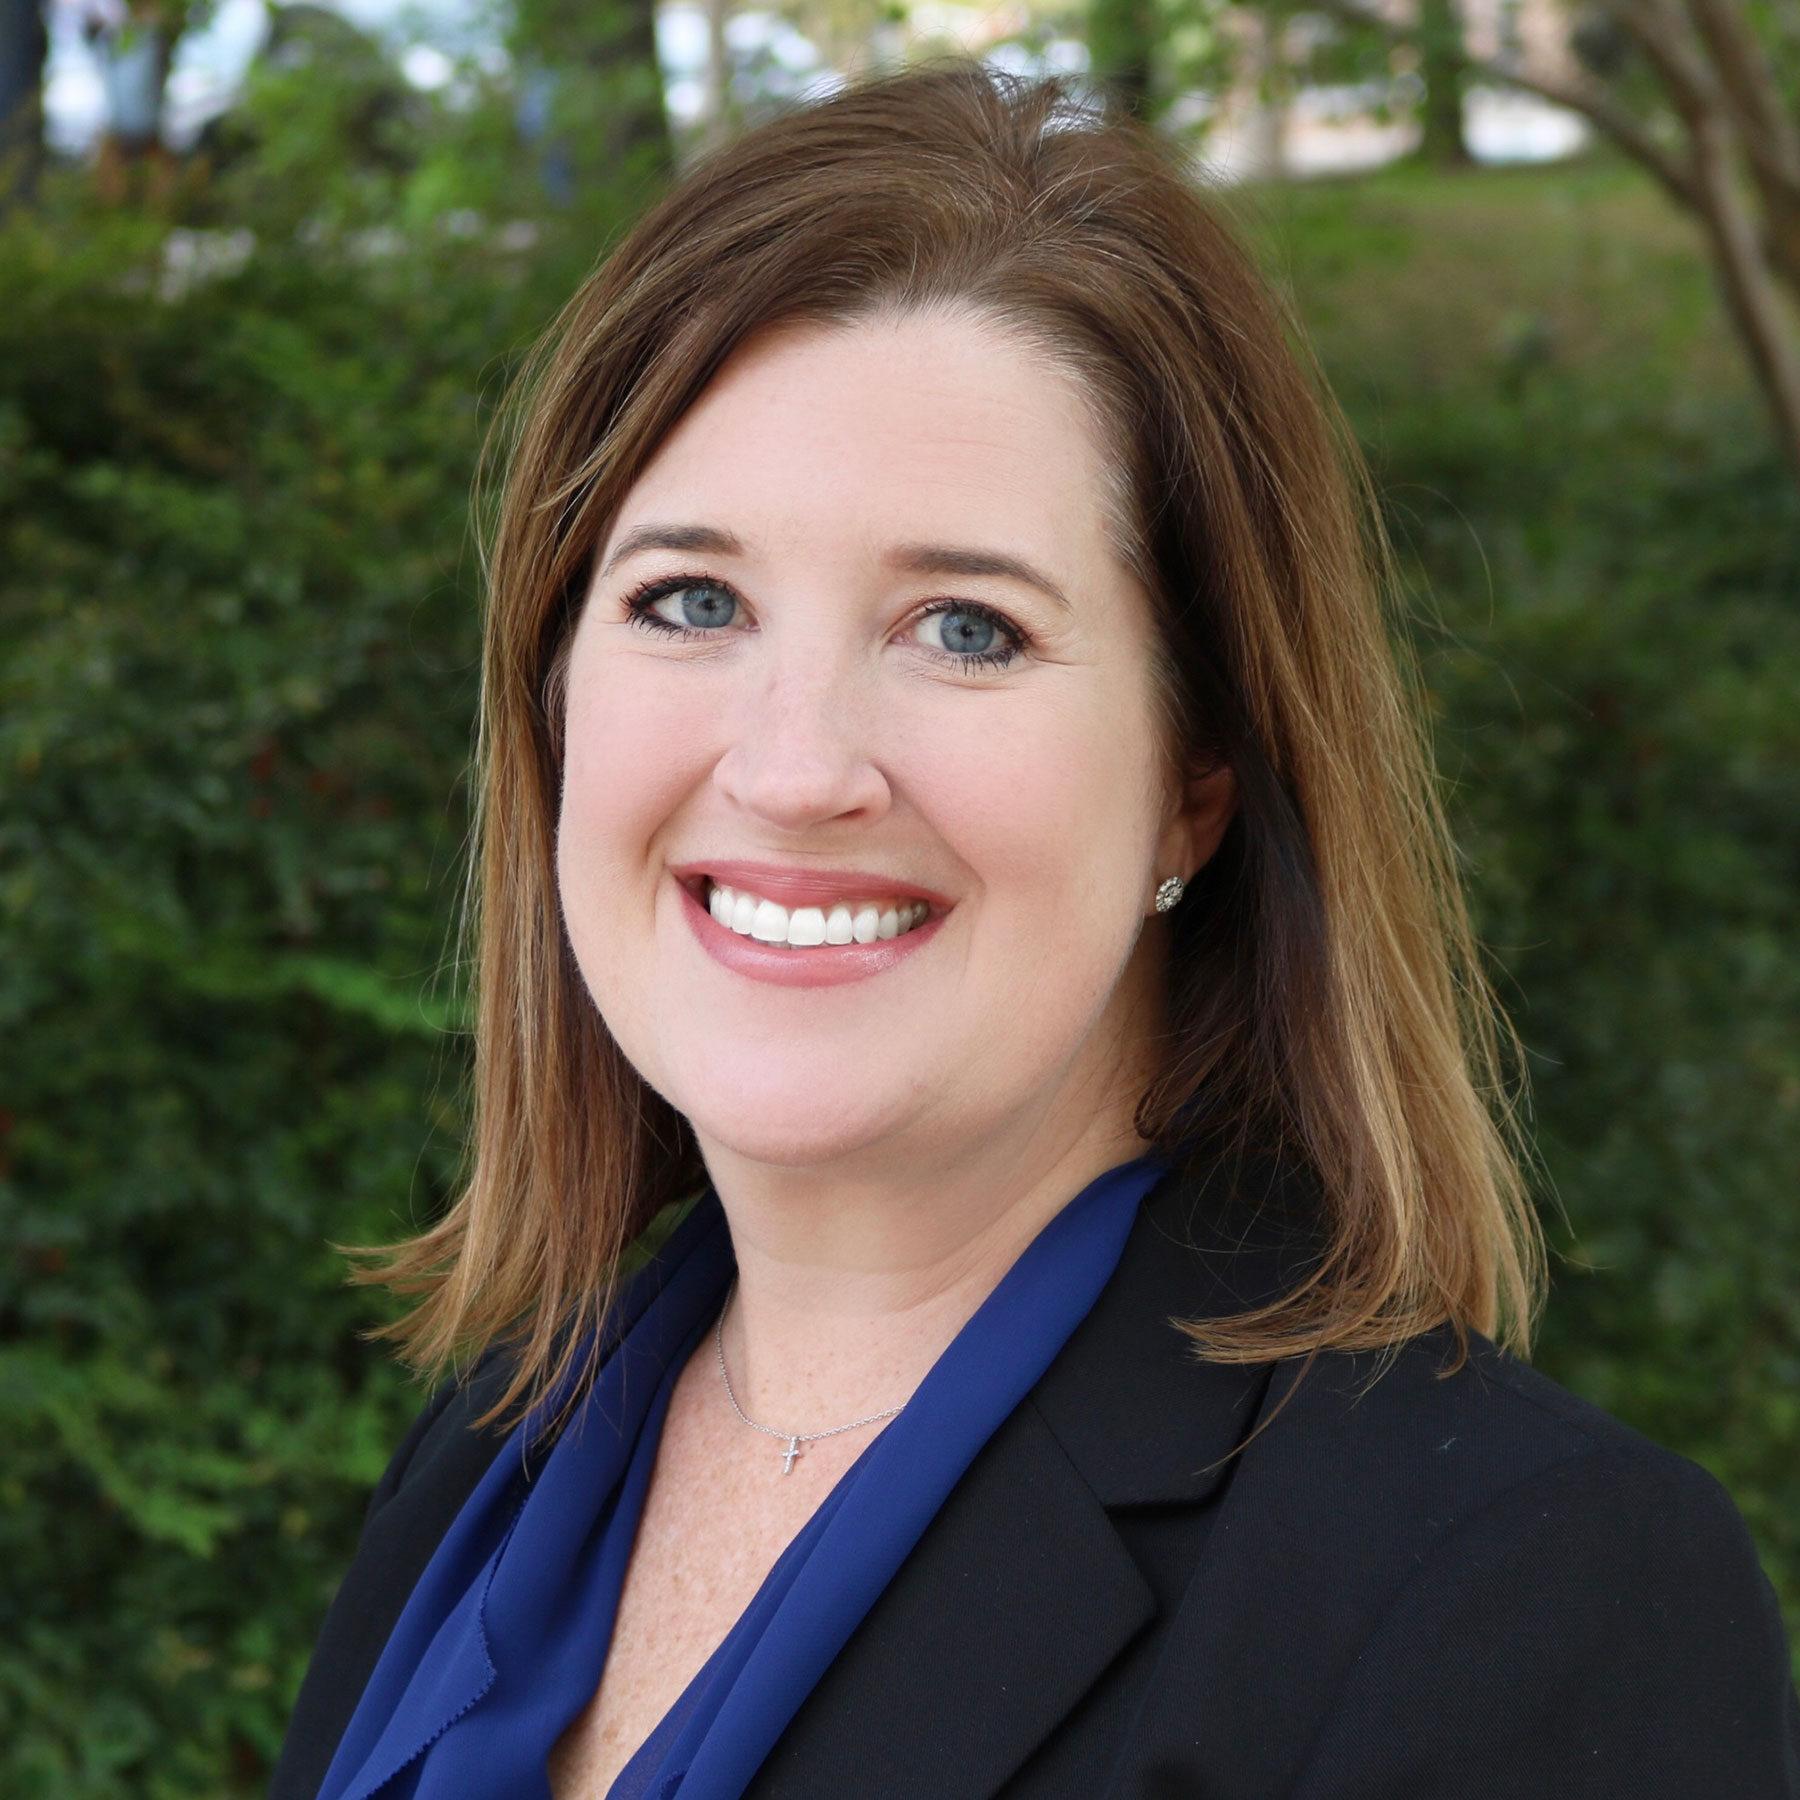 Headshot of Dr. Jennifer Porter